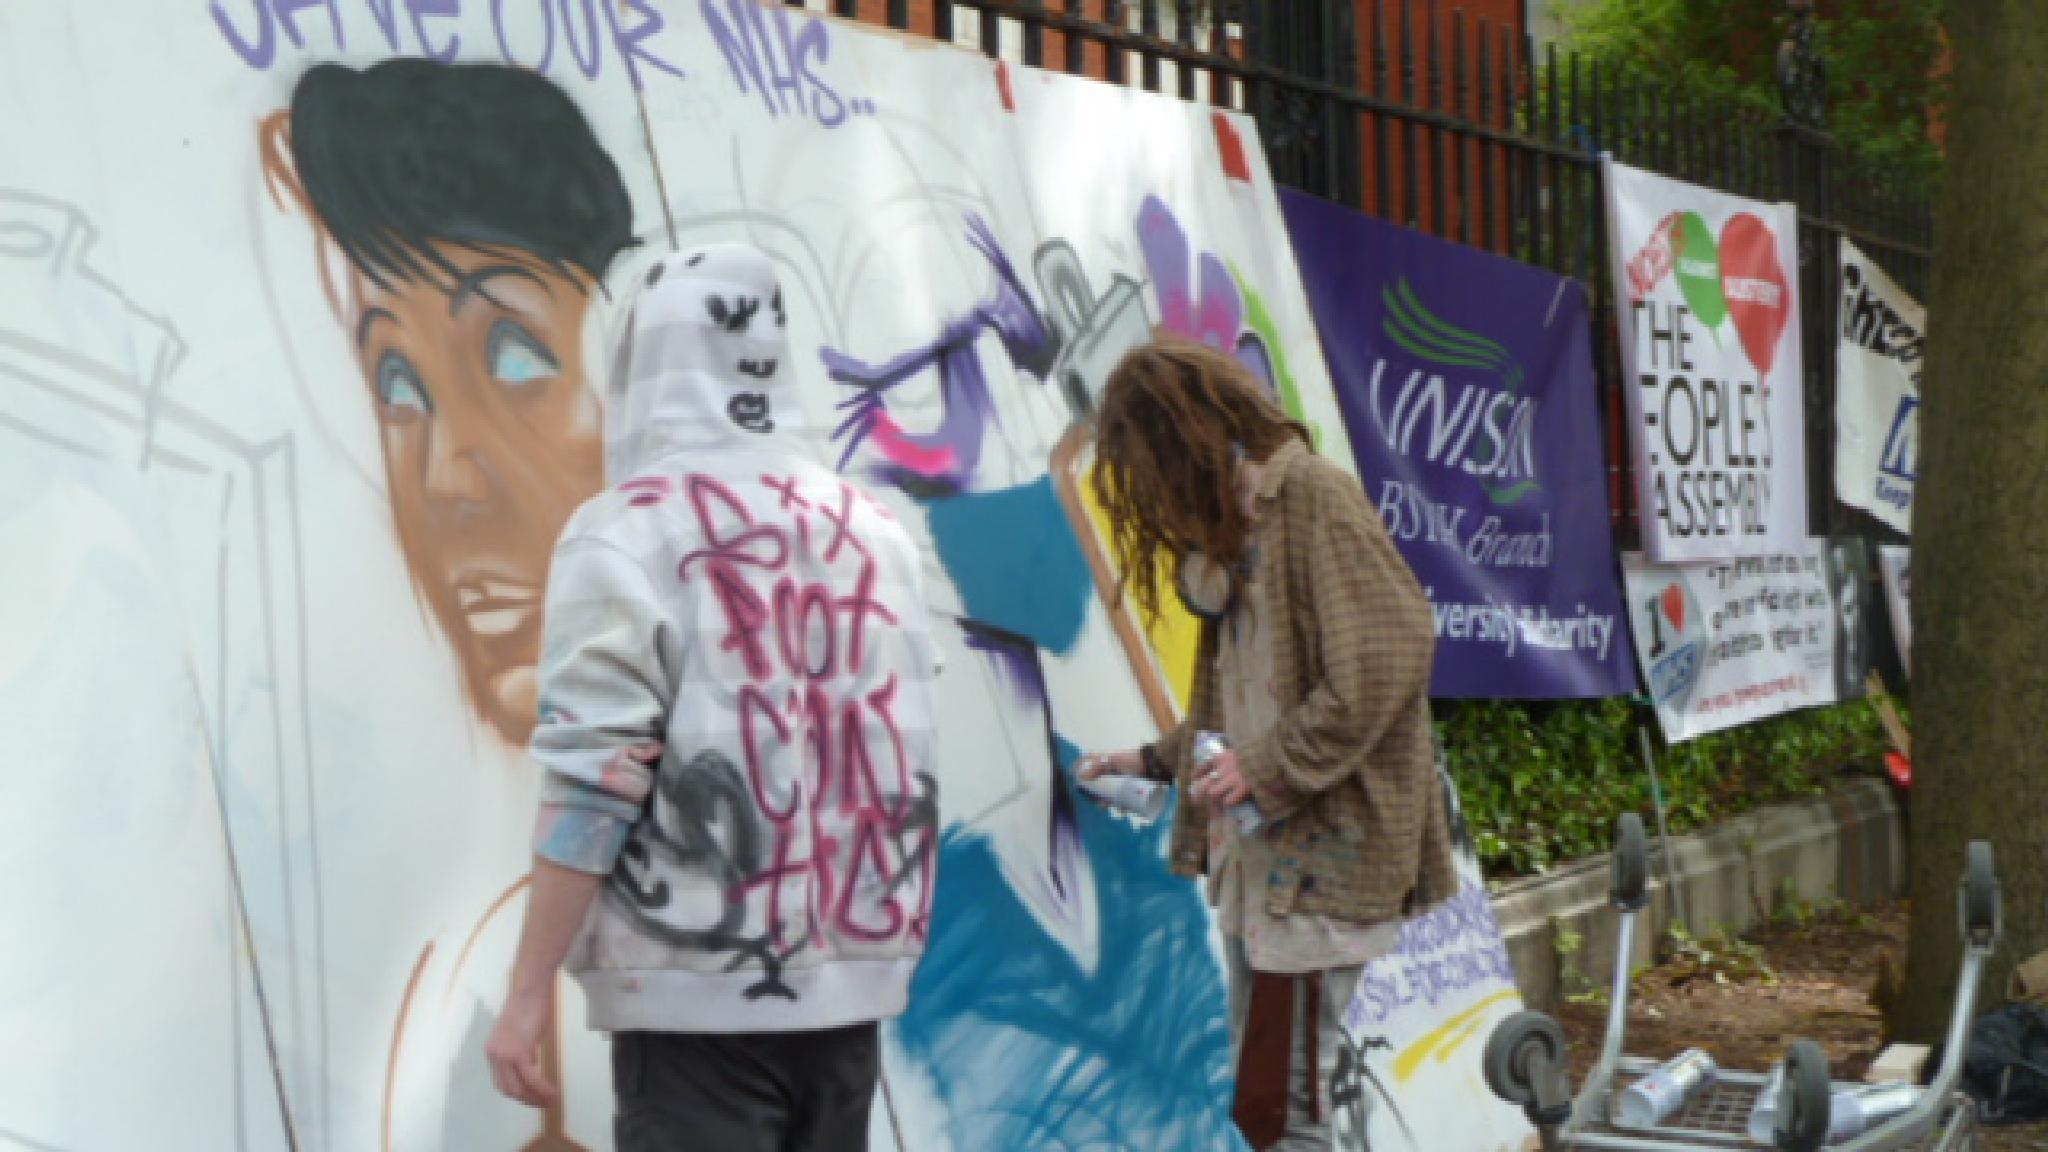 Street Art  by MikeyK